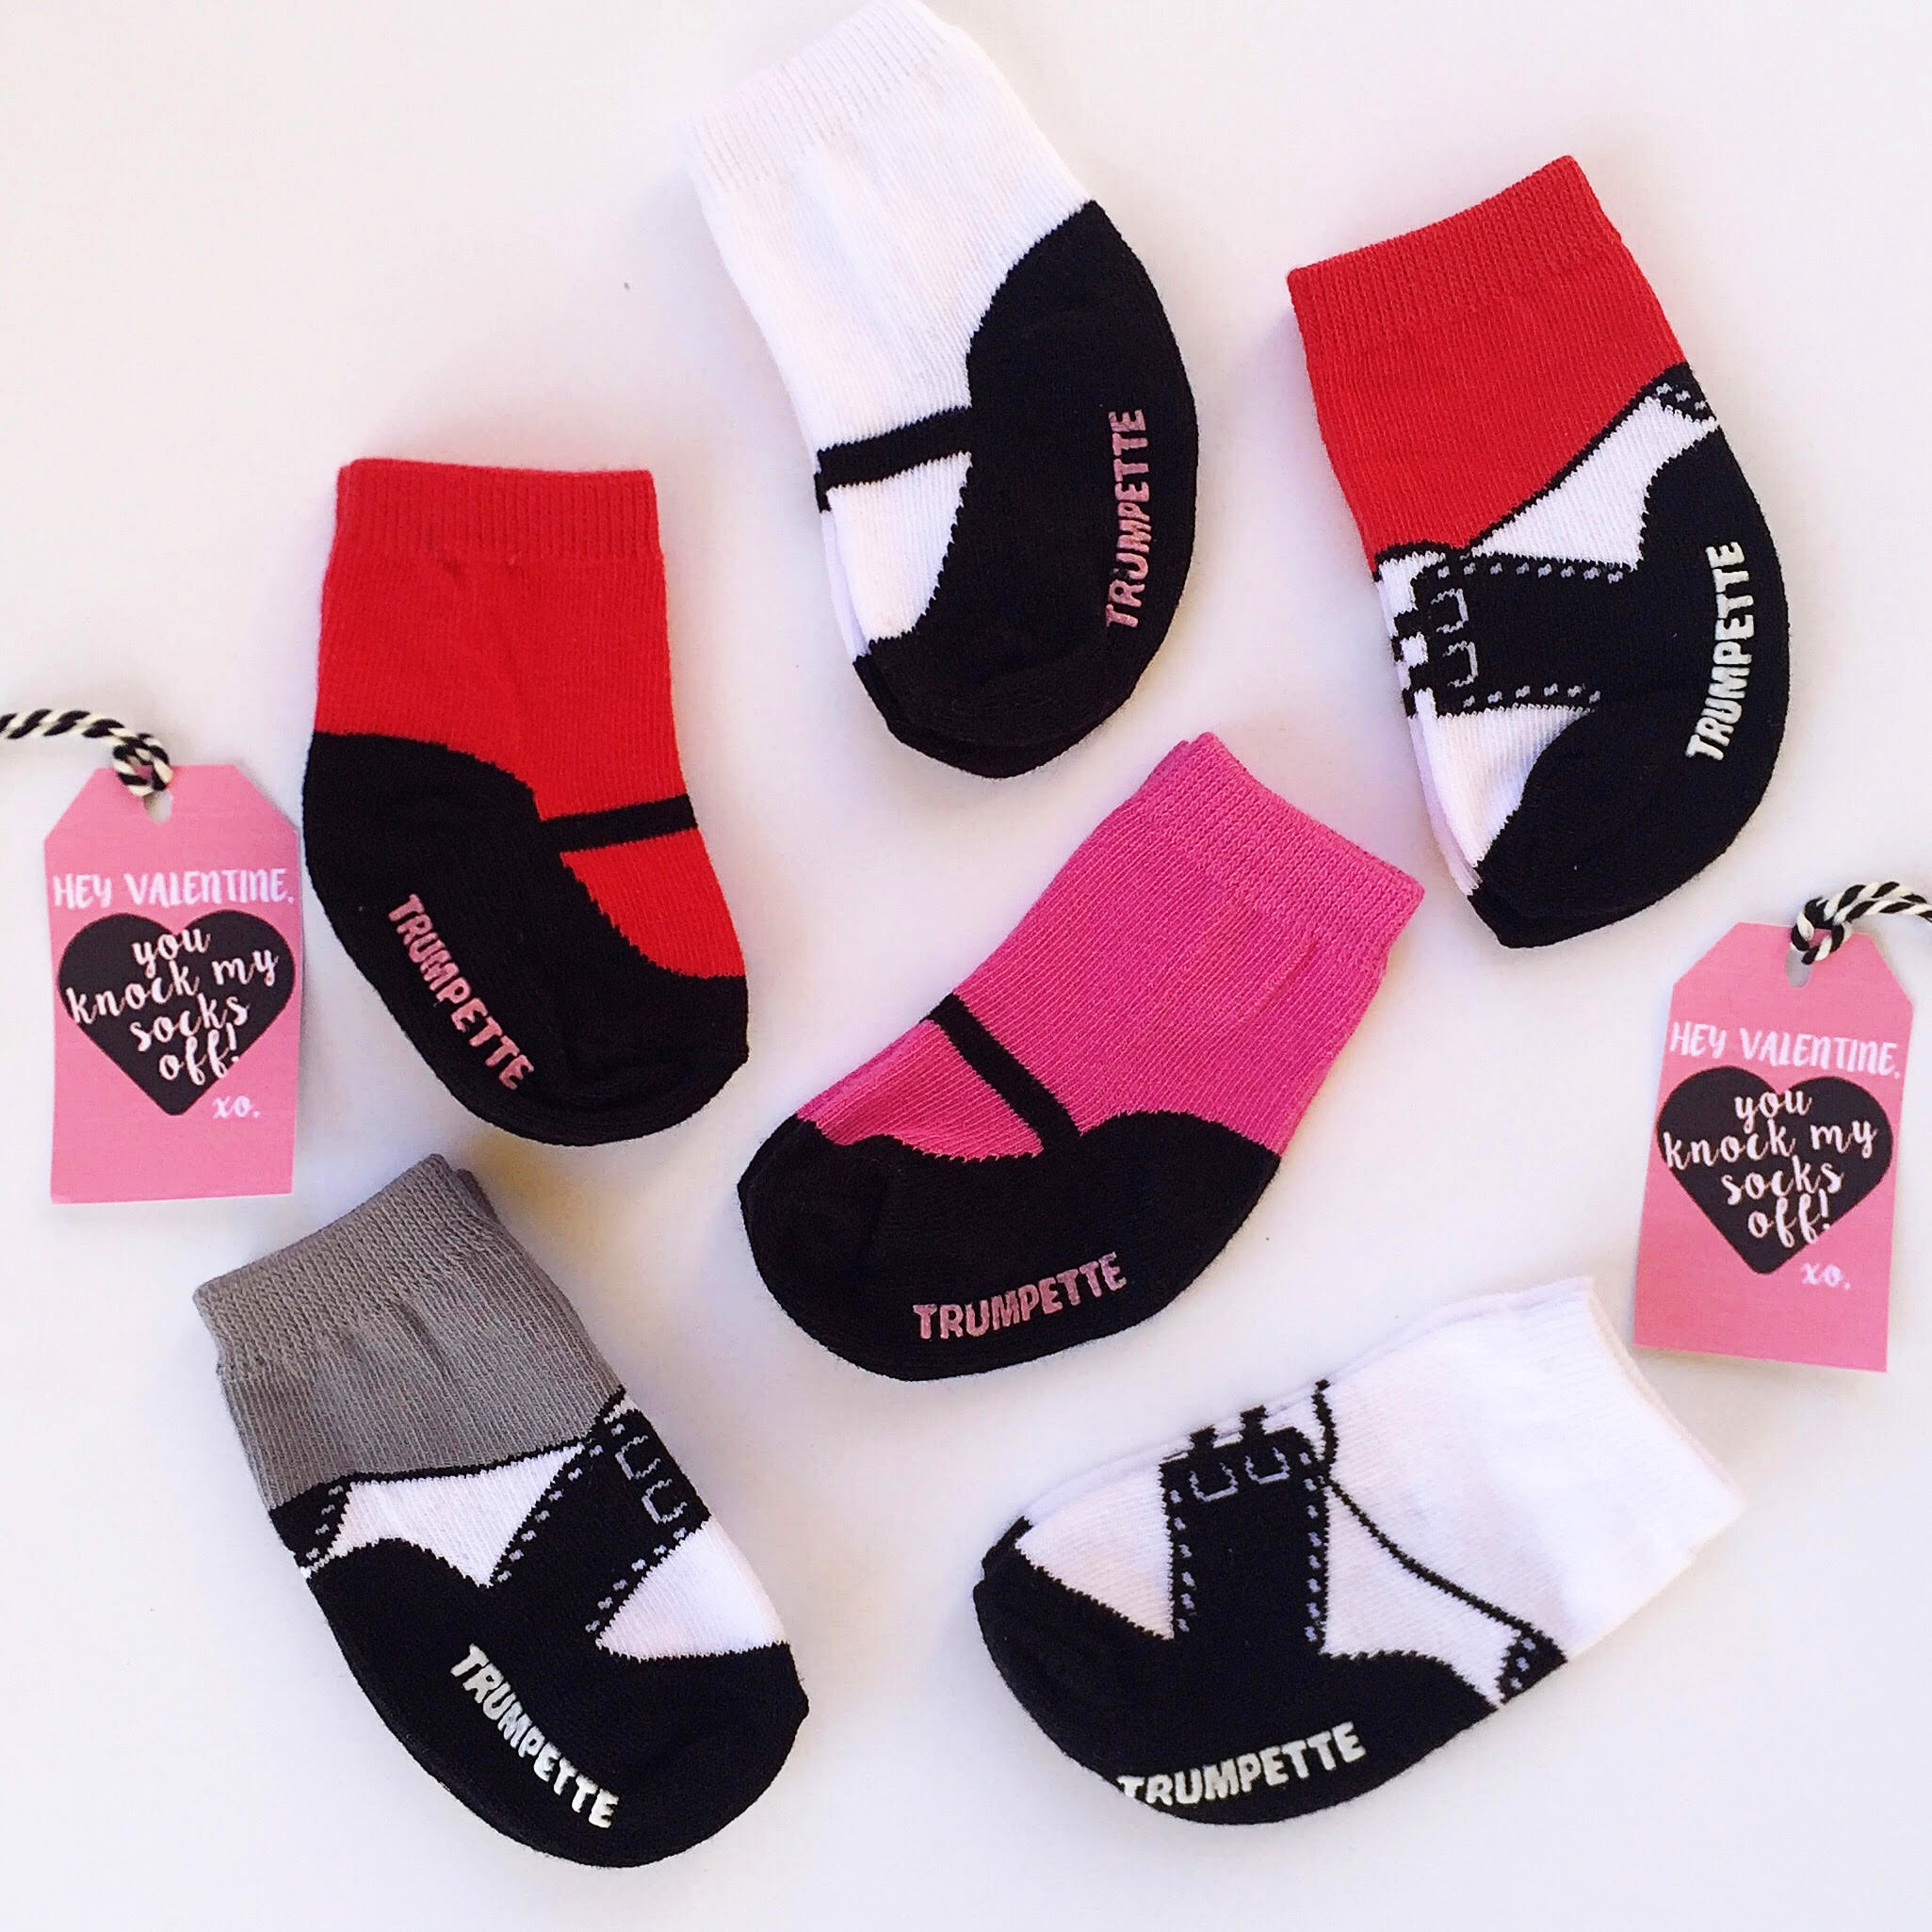 Valentines Day Knock My Socks Off Sock Printable | Momma Society-The Community of Modern Moms